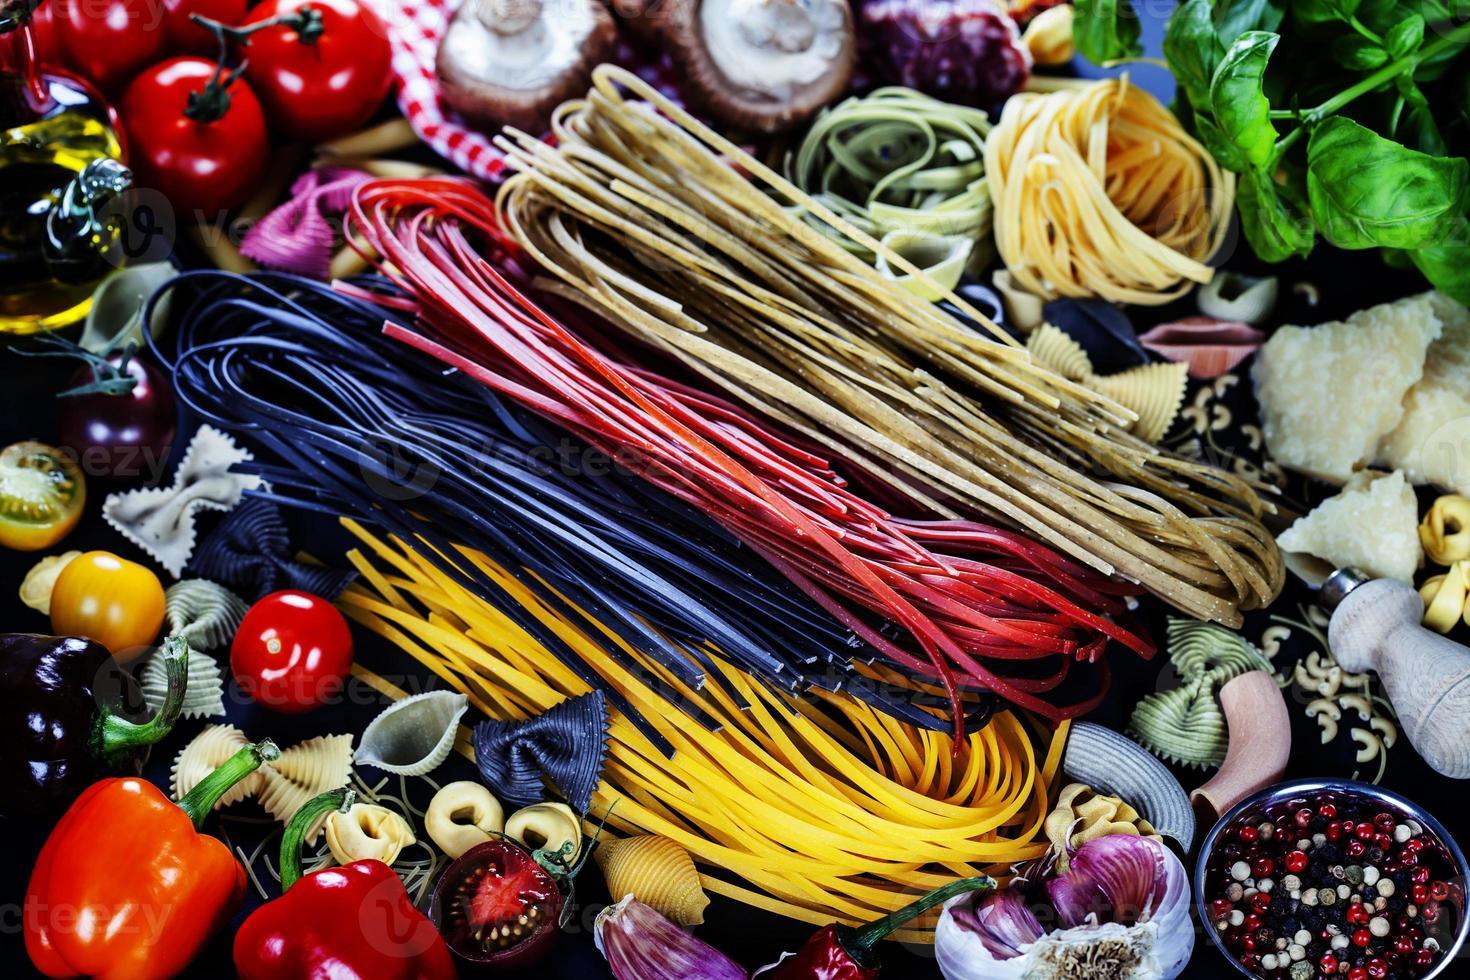 ingredientes italianos - macarrão, legumes, temperos, queijo foto